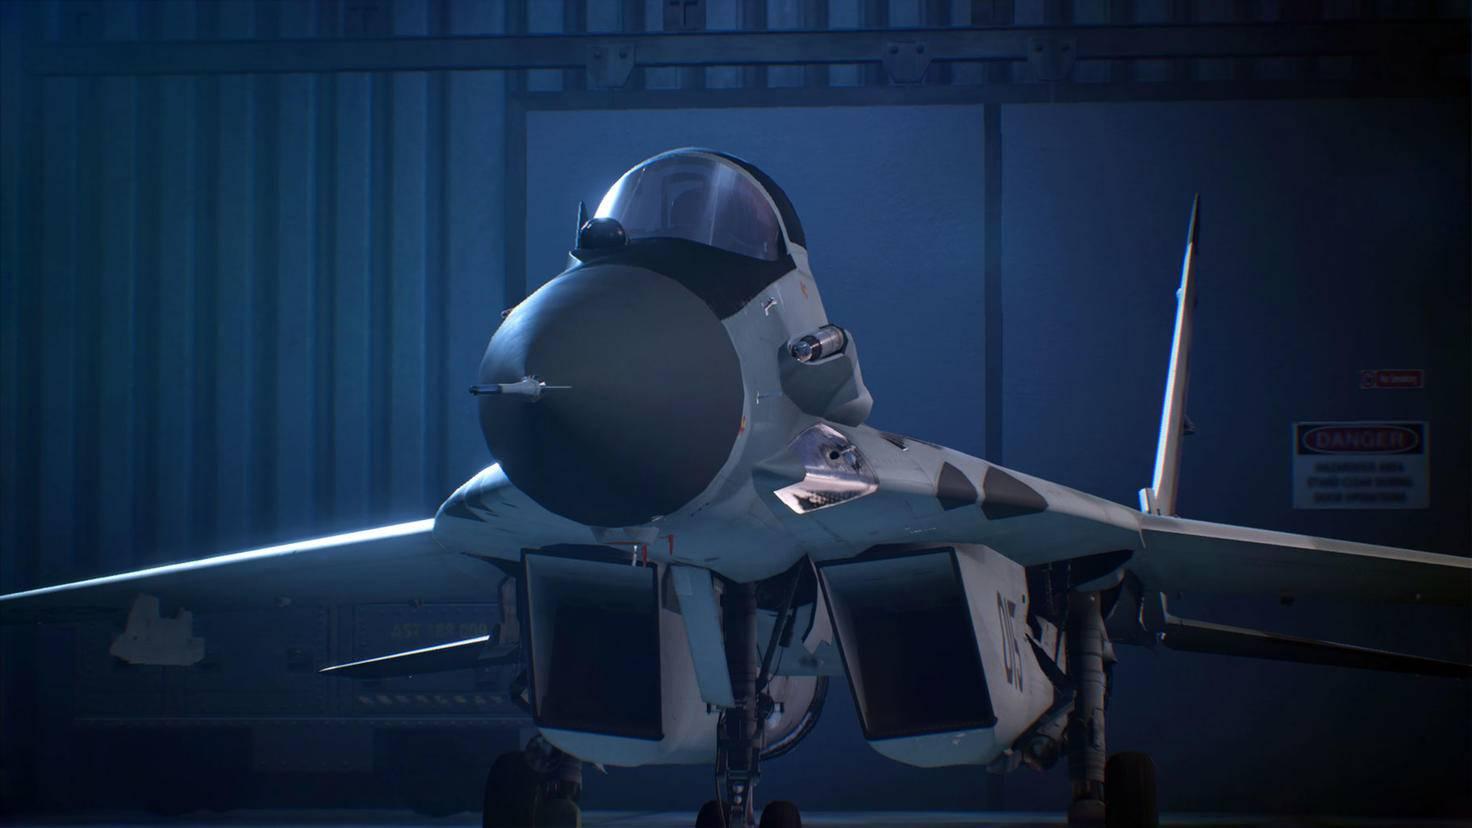 ace-combat-7-ps4-screenshot-02